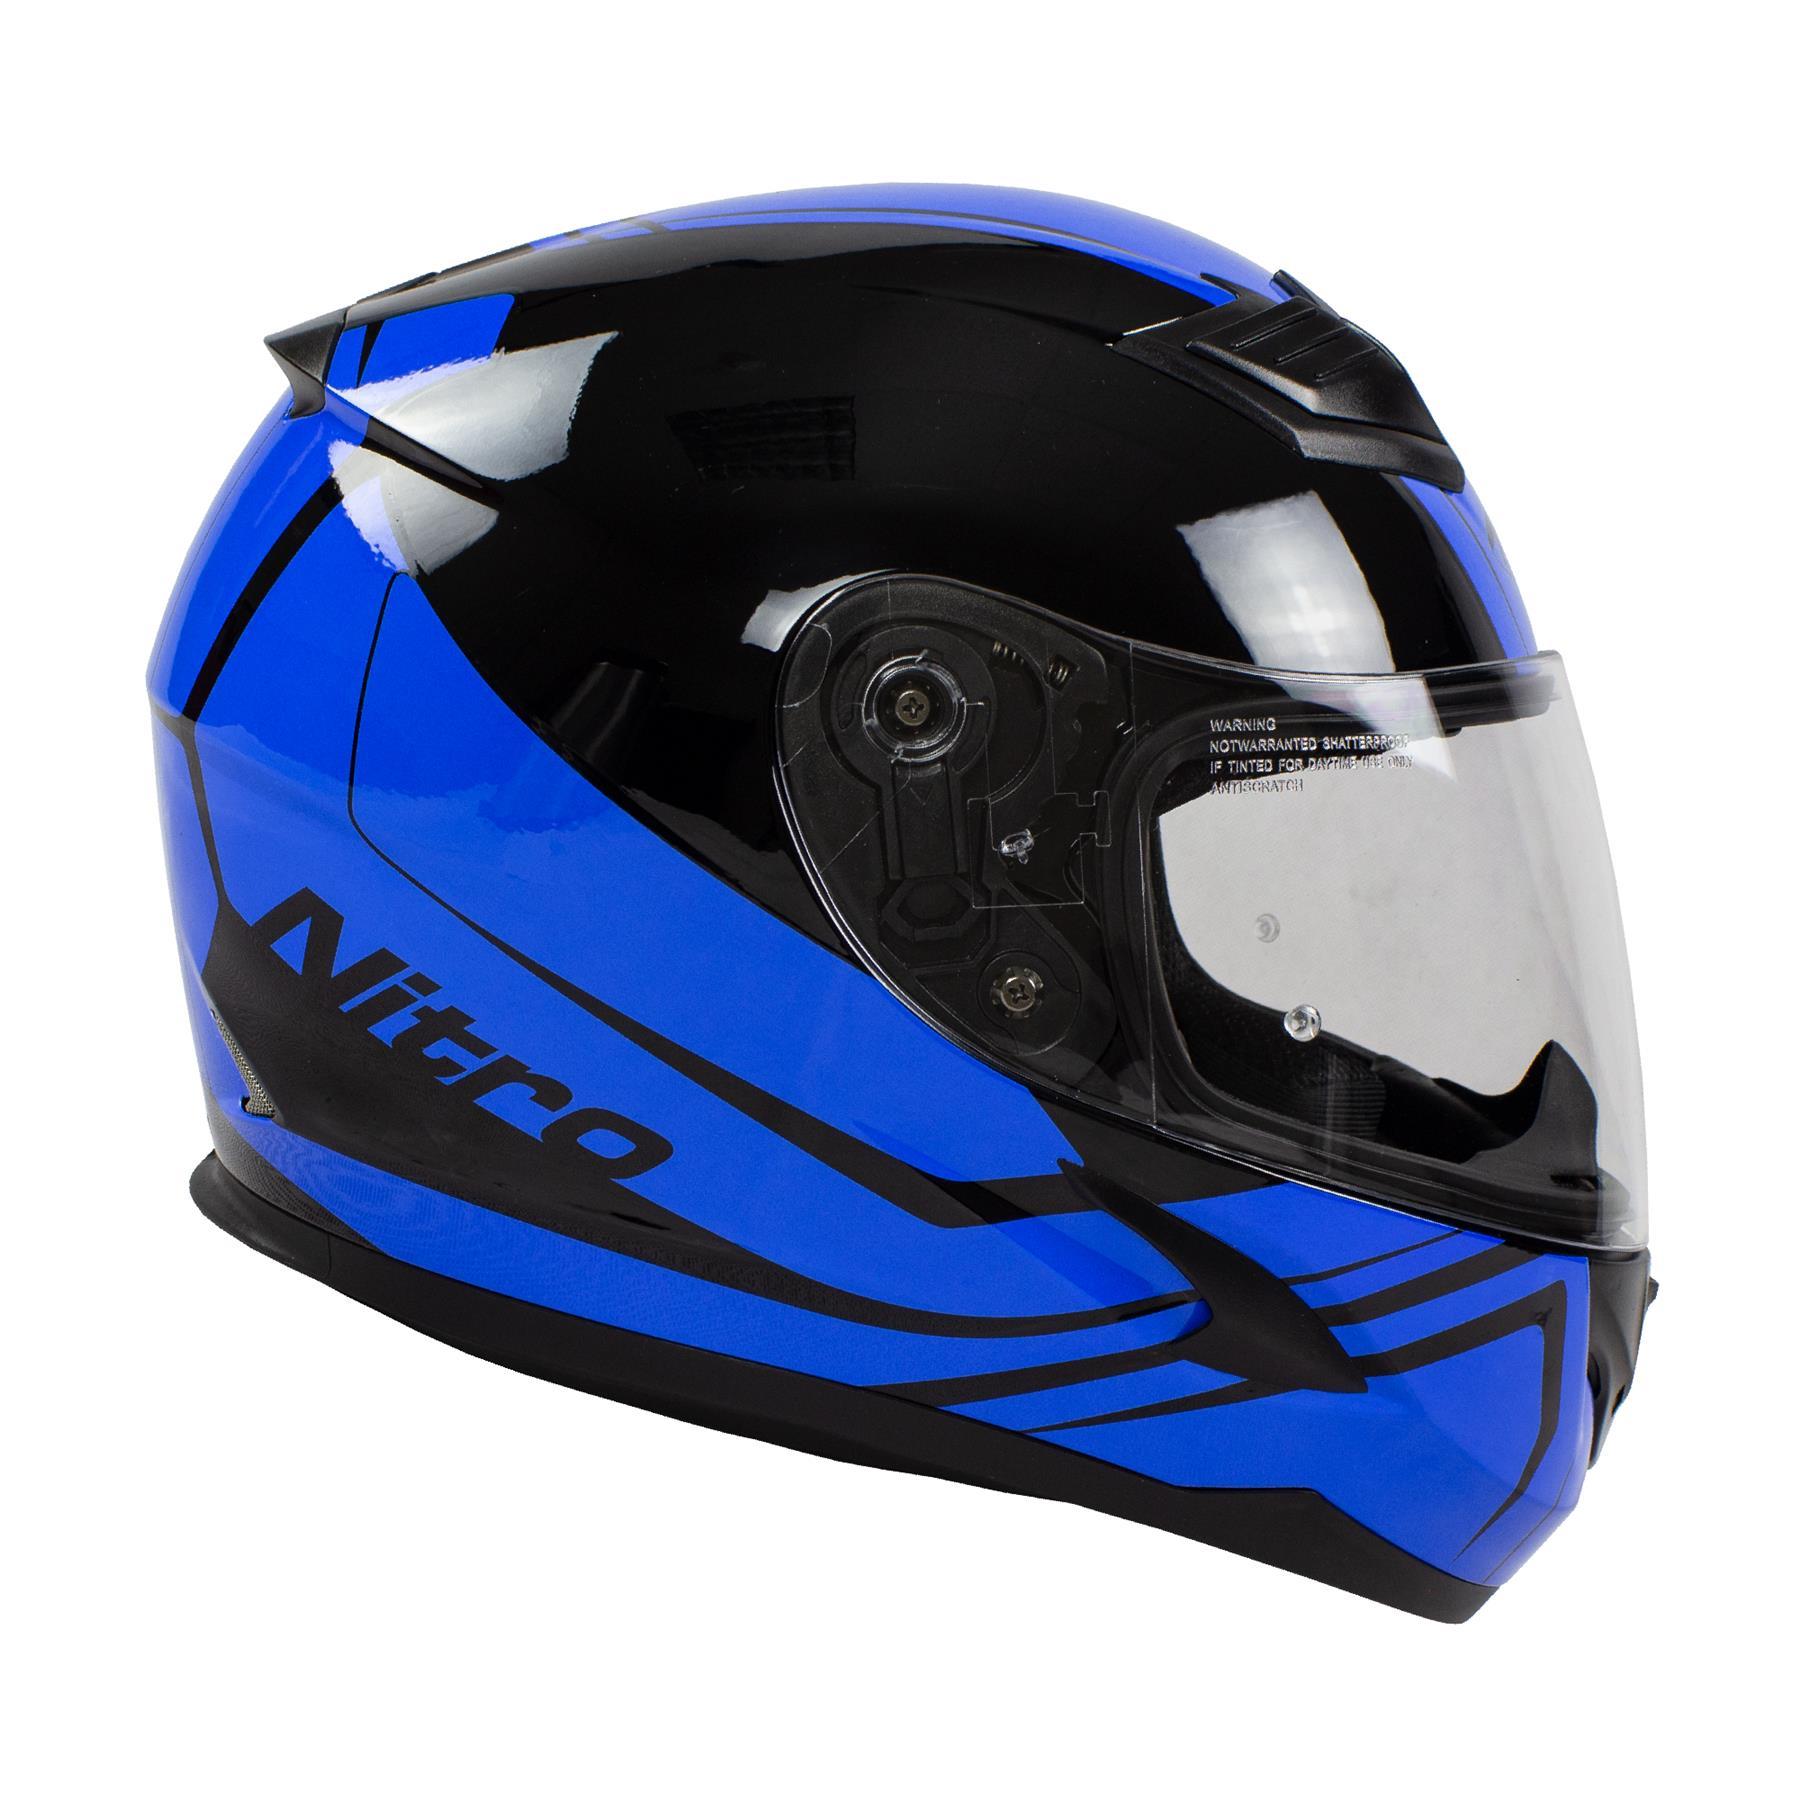 Nitro-N2400-Rogue-Full-Face-Motorcycle-Motorbike-Crash-Helmet-Black-Blue-Red thumbnail 15